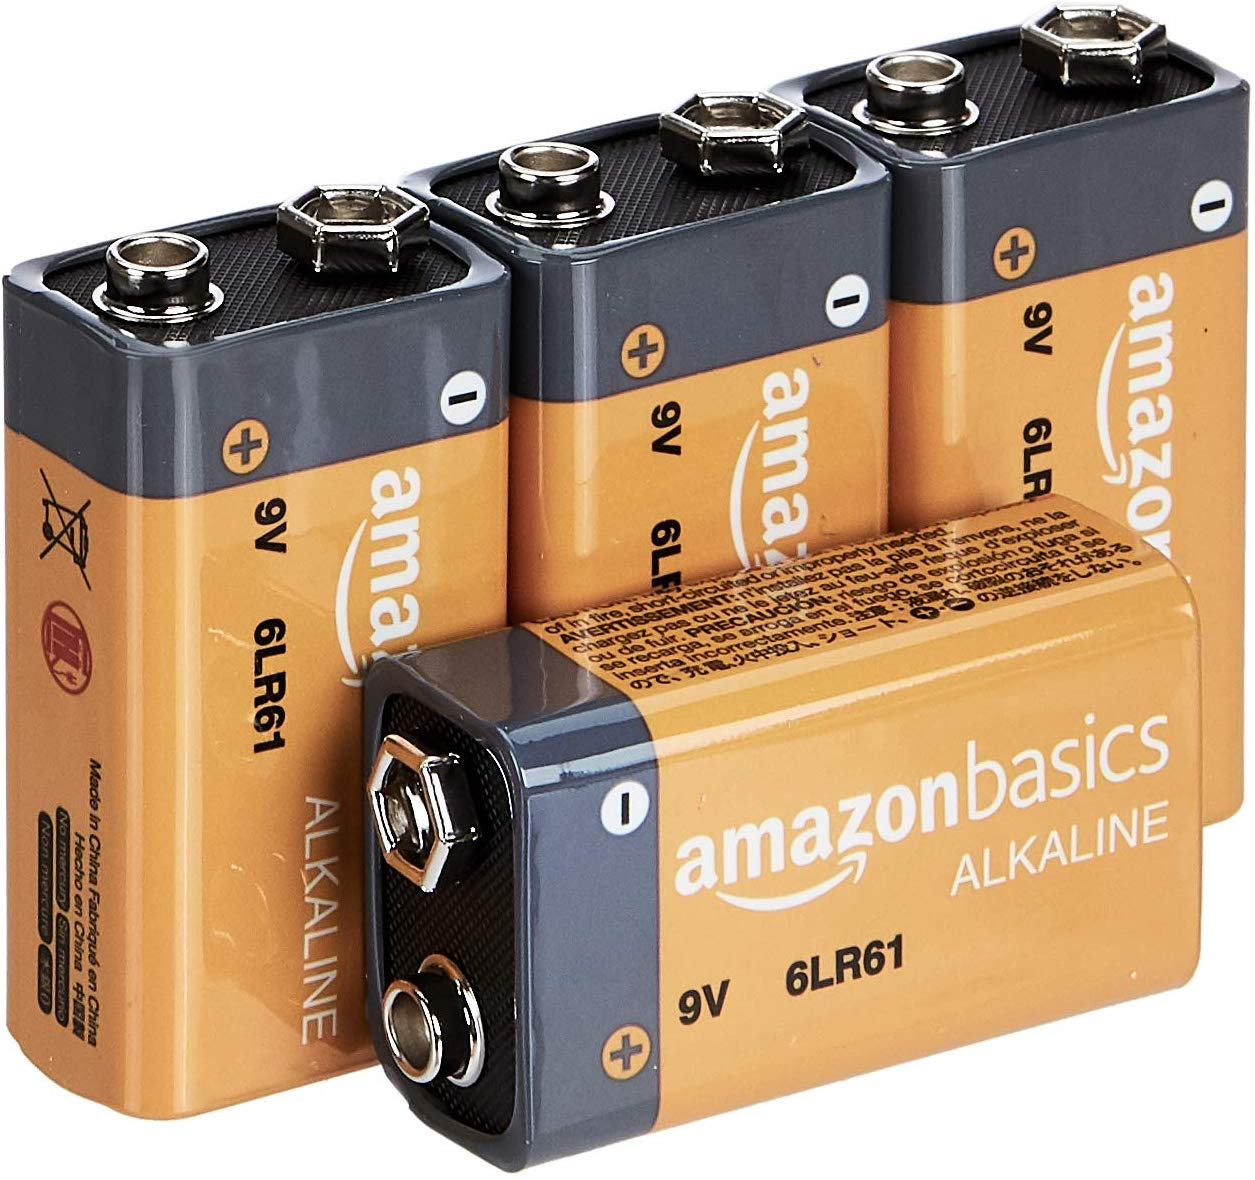 9v battery amazonbasics